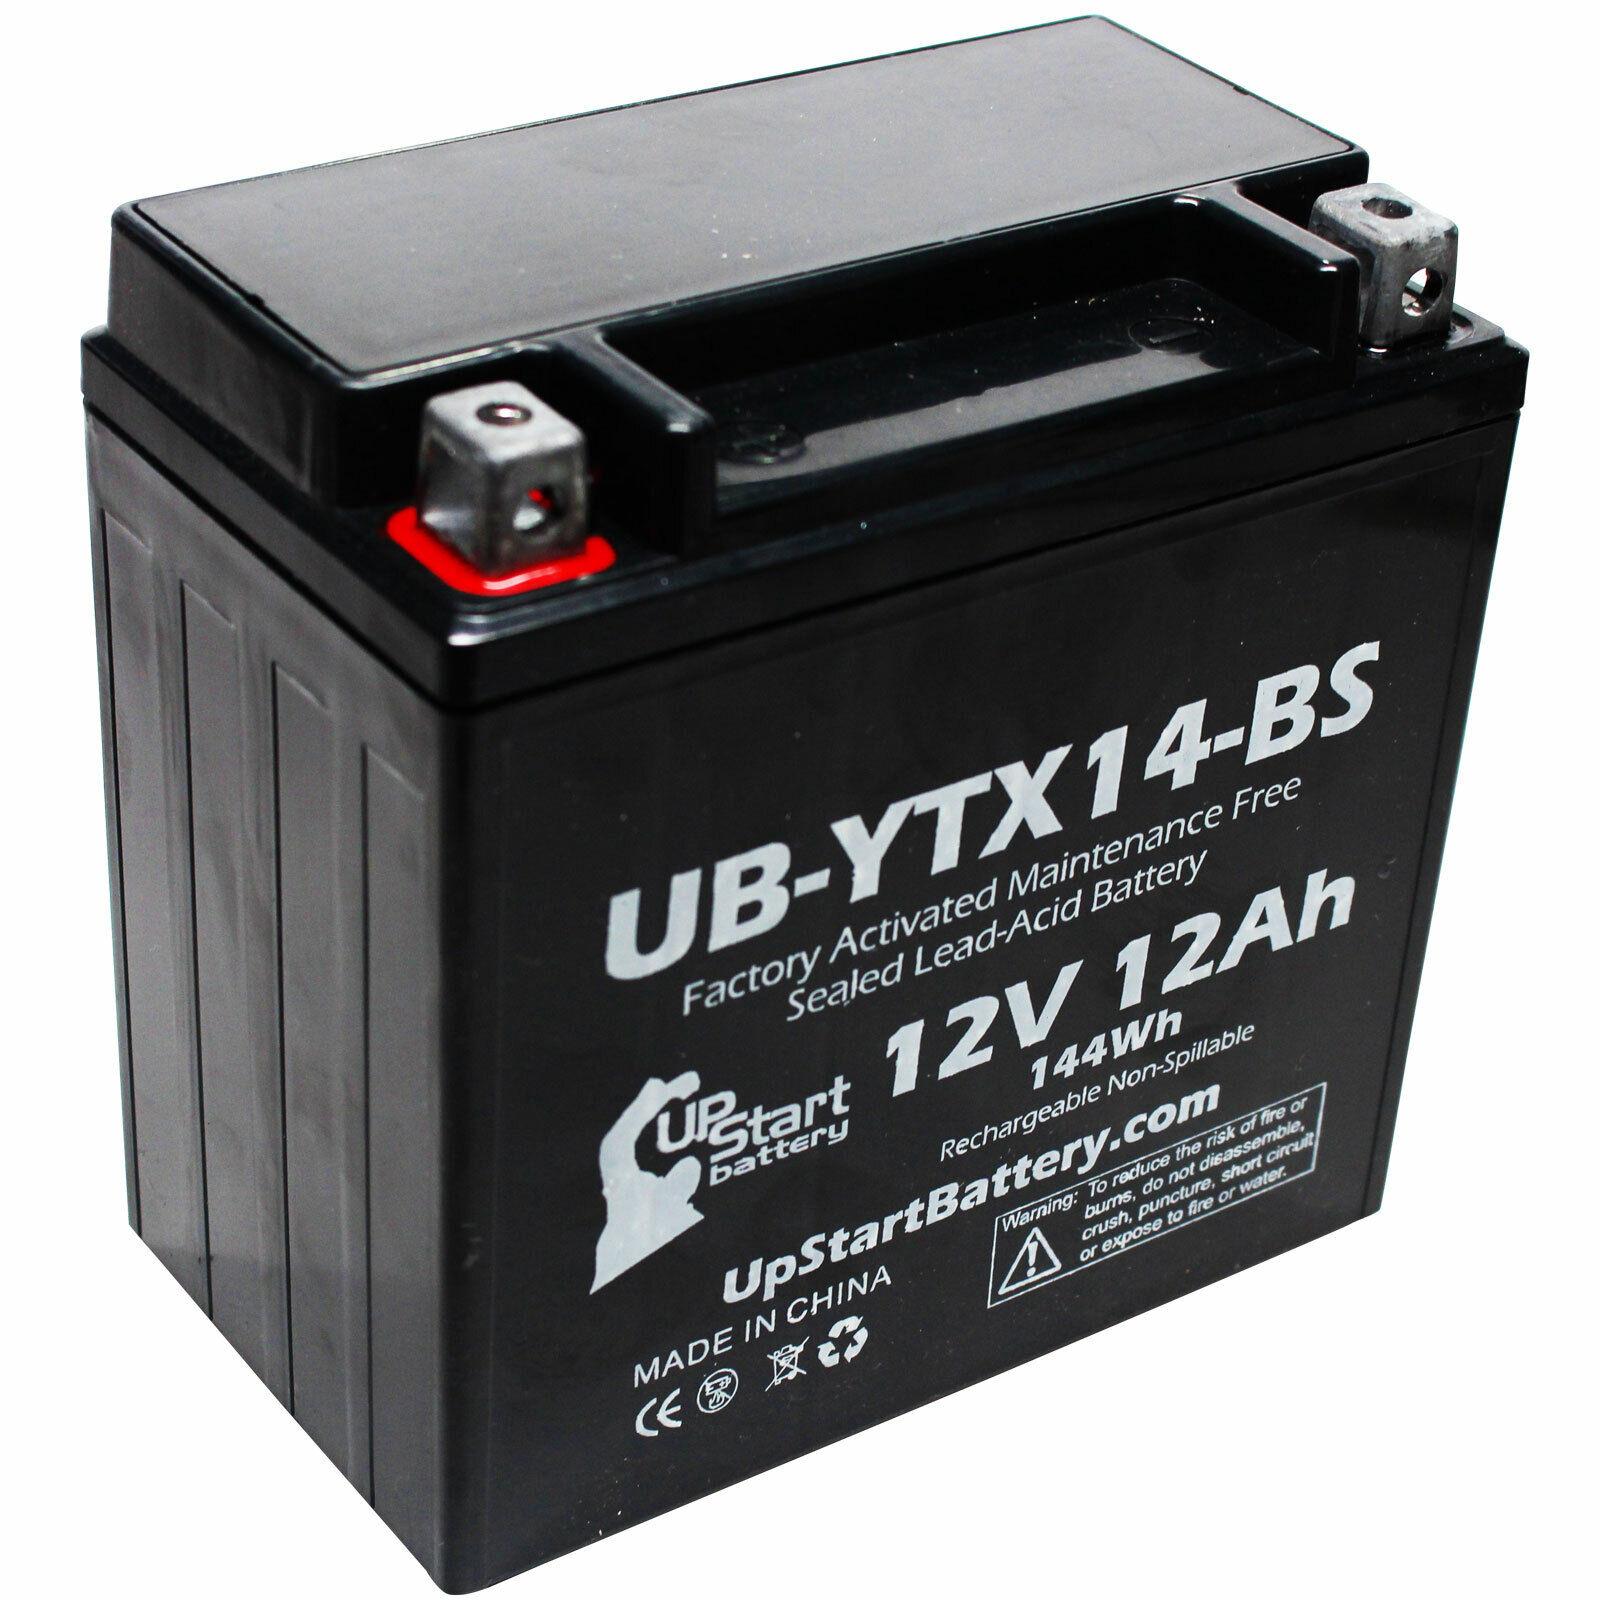 12V 12AH Battery for 2000 Honda TRX350 Rancher 350 CC